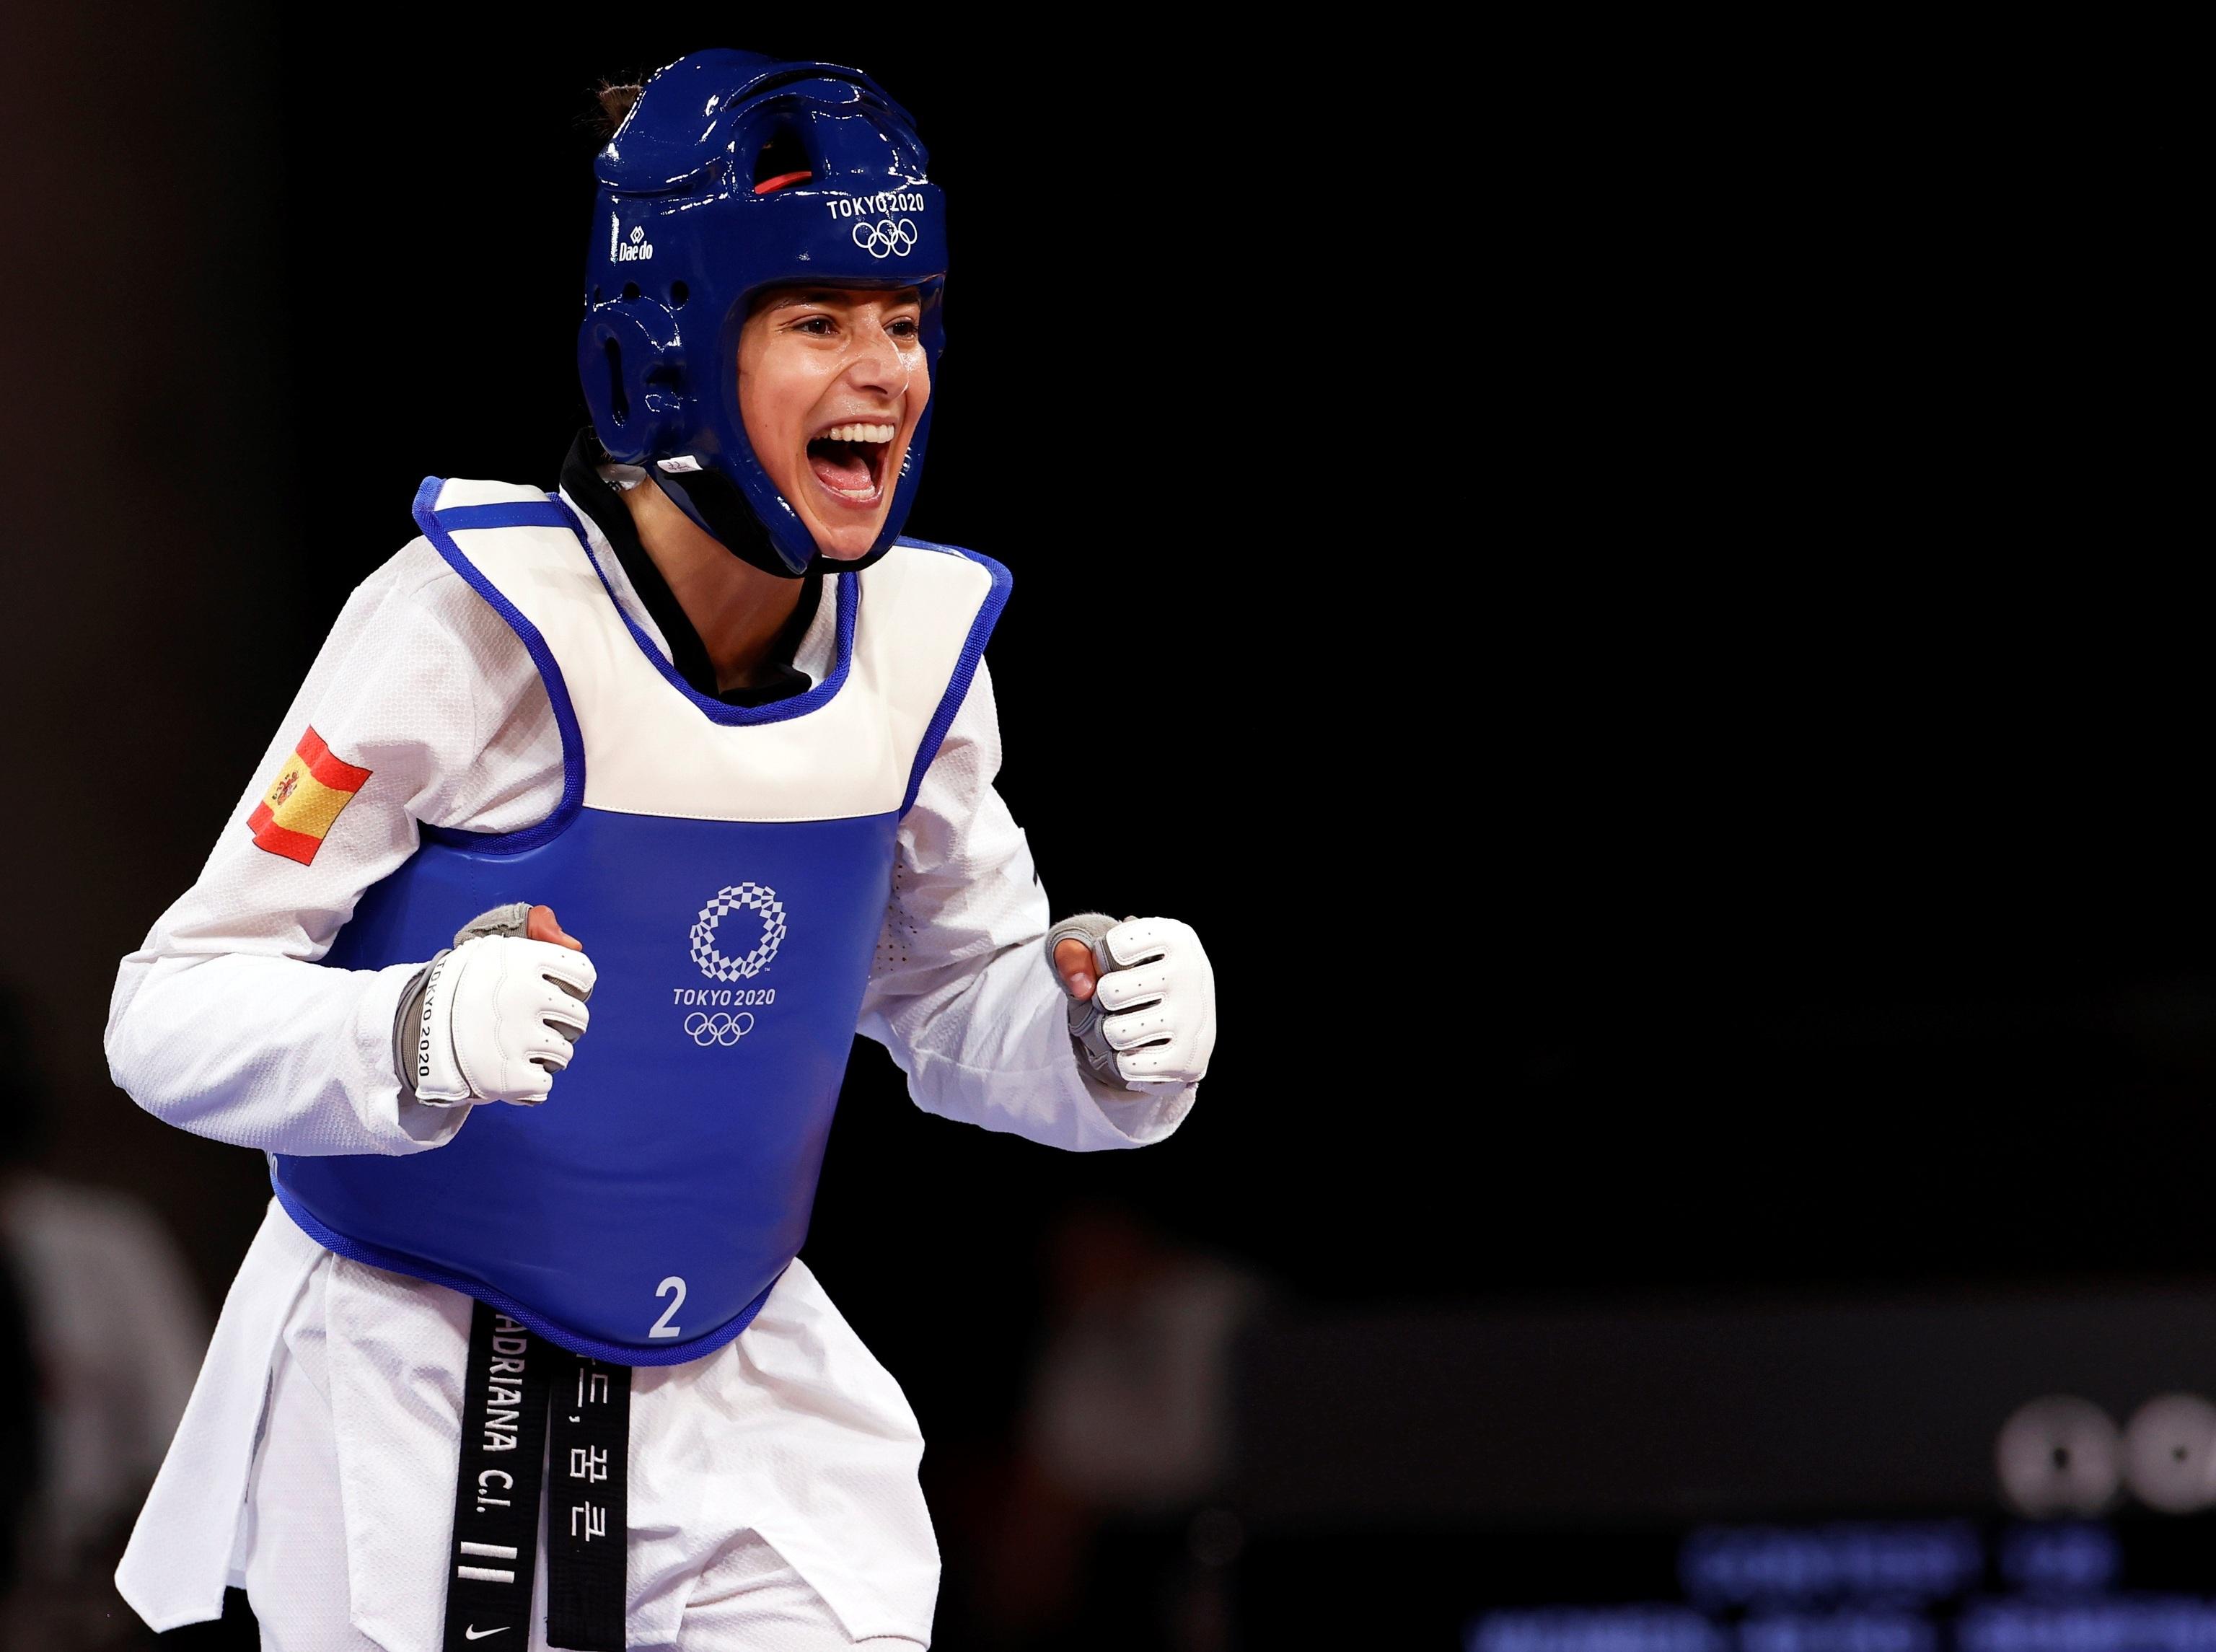 Adriana Cerezo - taekwondo - Juegos Olímpicos 2021 - Tokio 2020